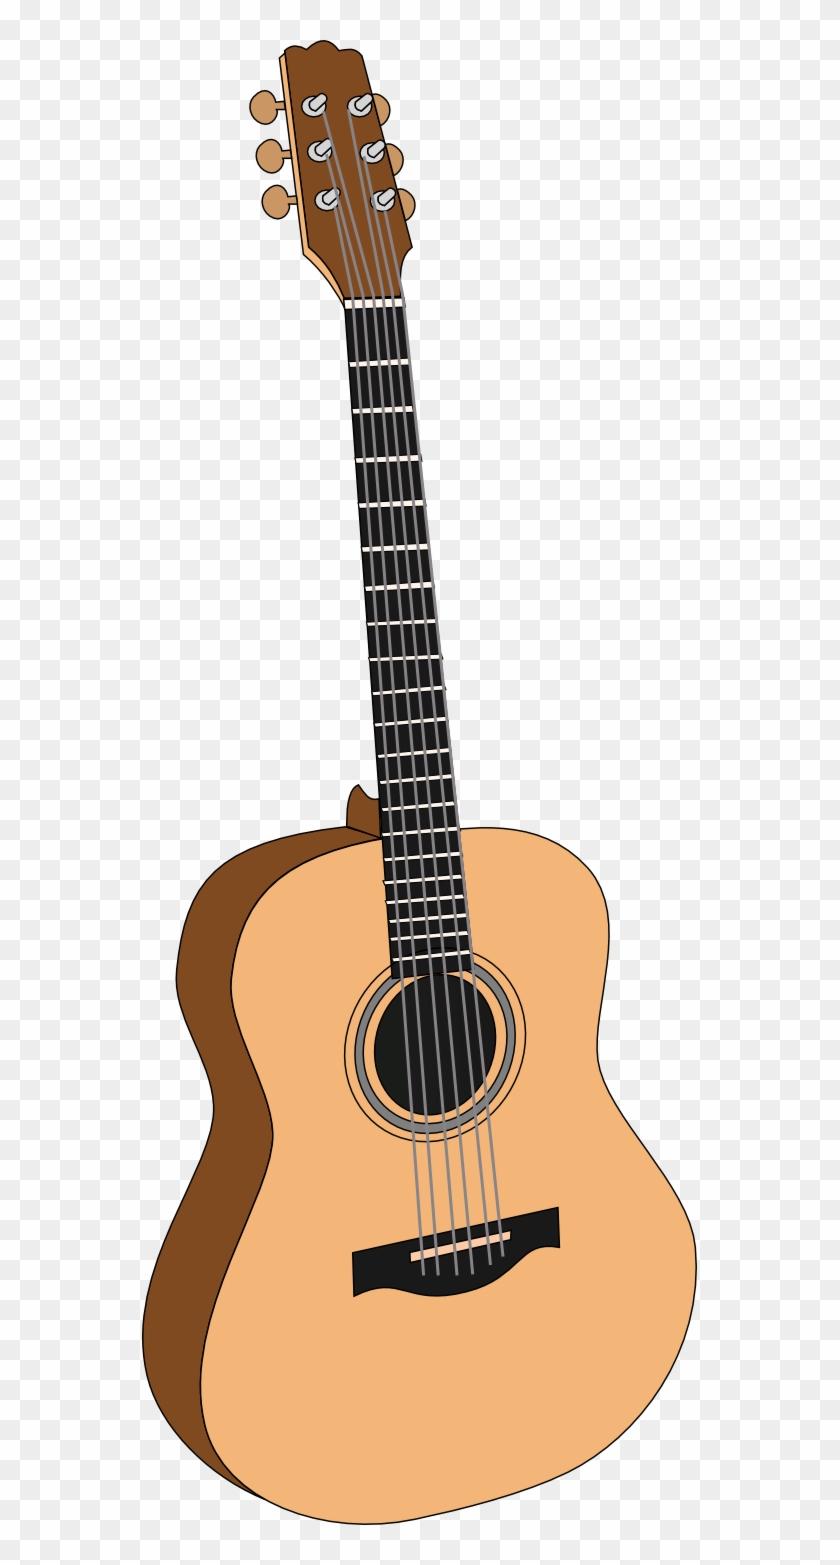 Guitar Images Clip Art : guitar, images, Library, Images, Guitar, Clipart, Download, Files, ▻▻▻